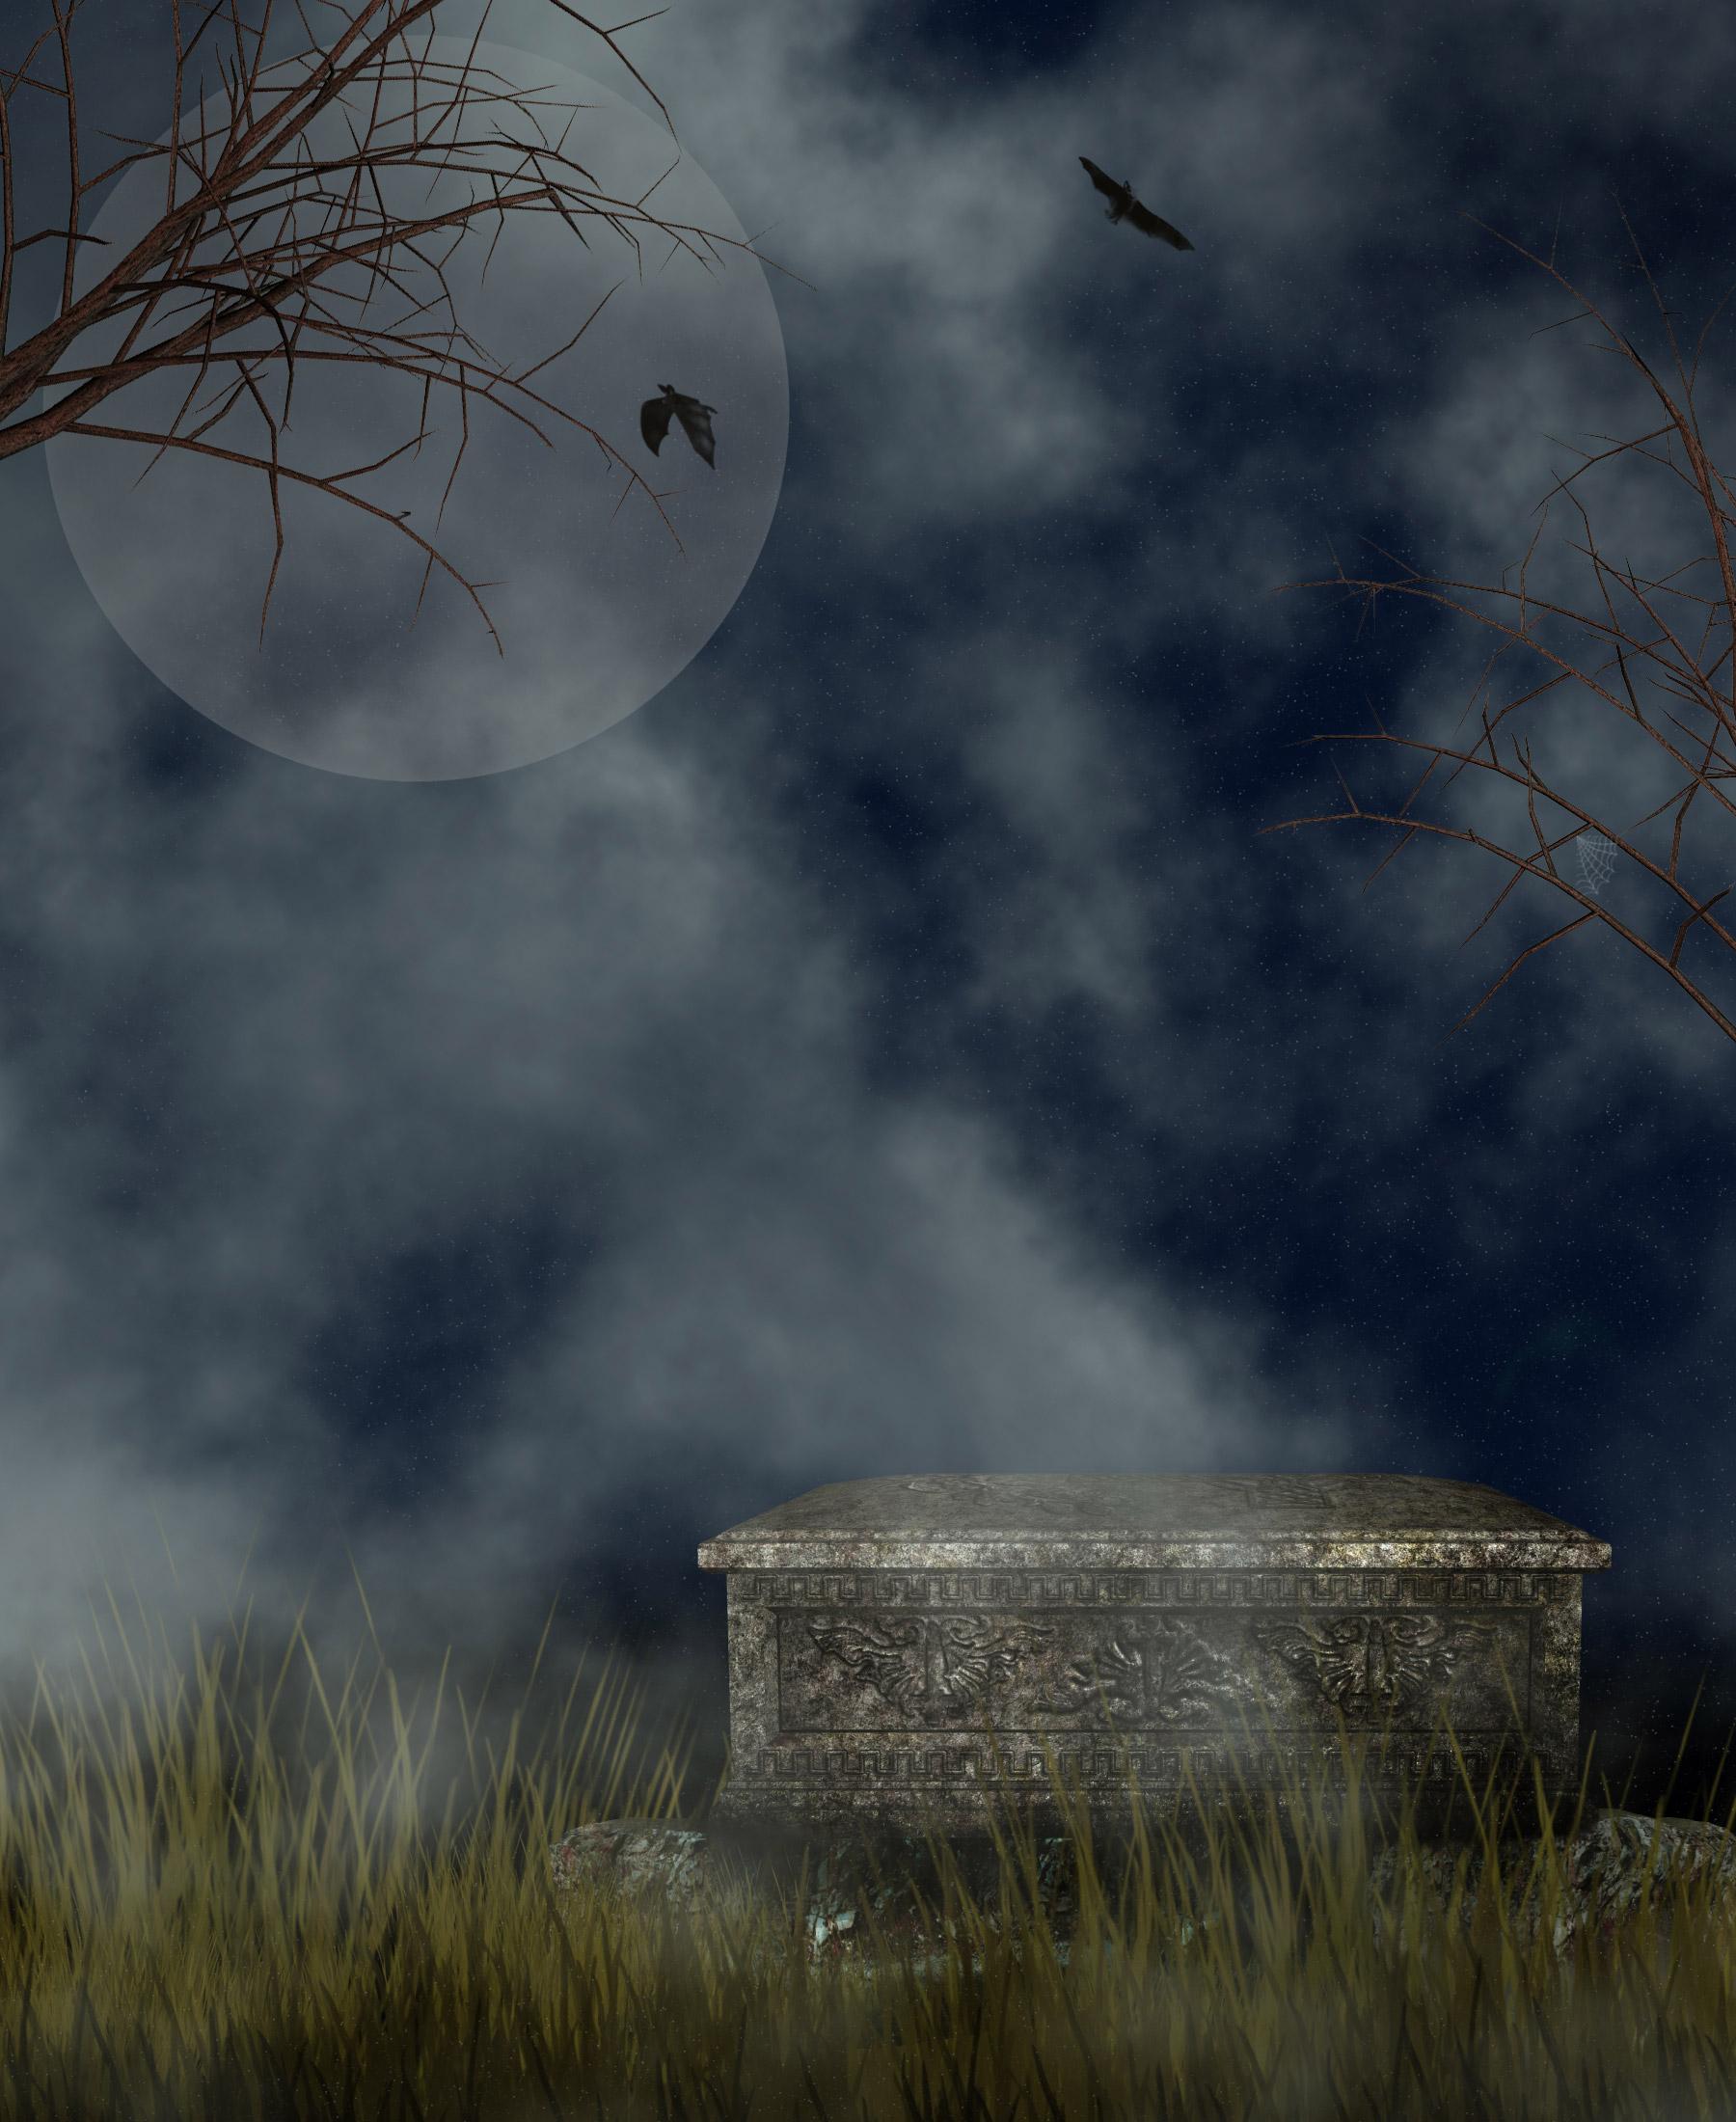 Halloween 2013 Backgrounds amp Wallpapers 1800x2200